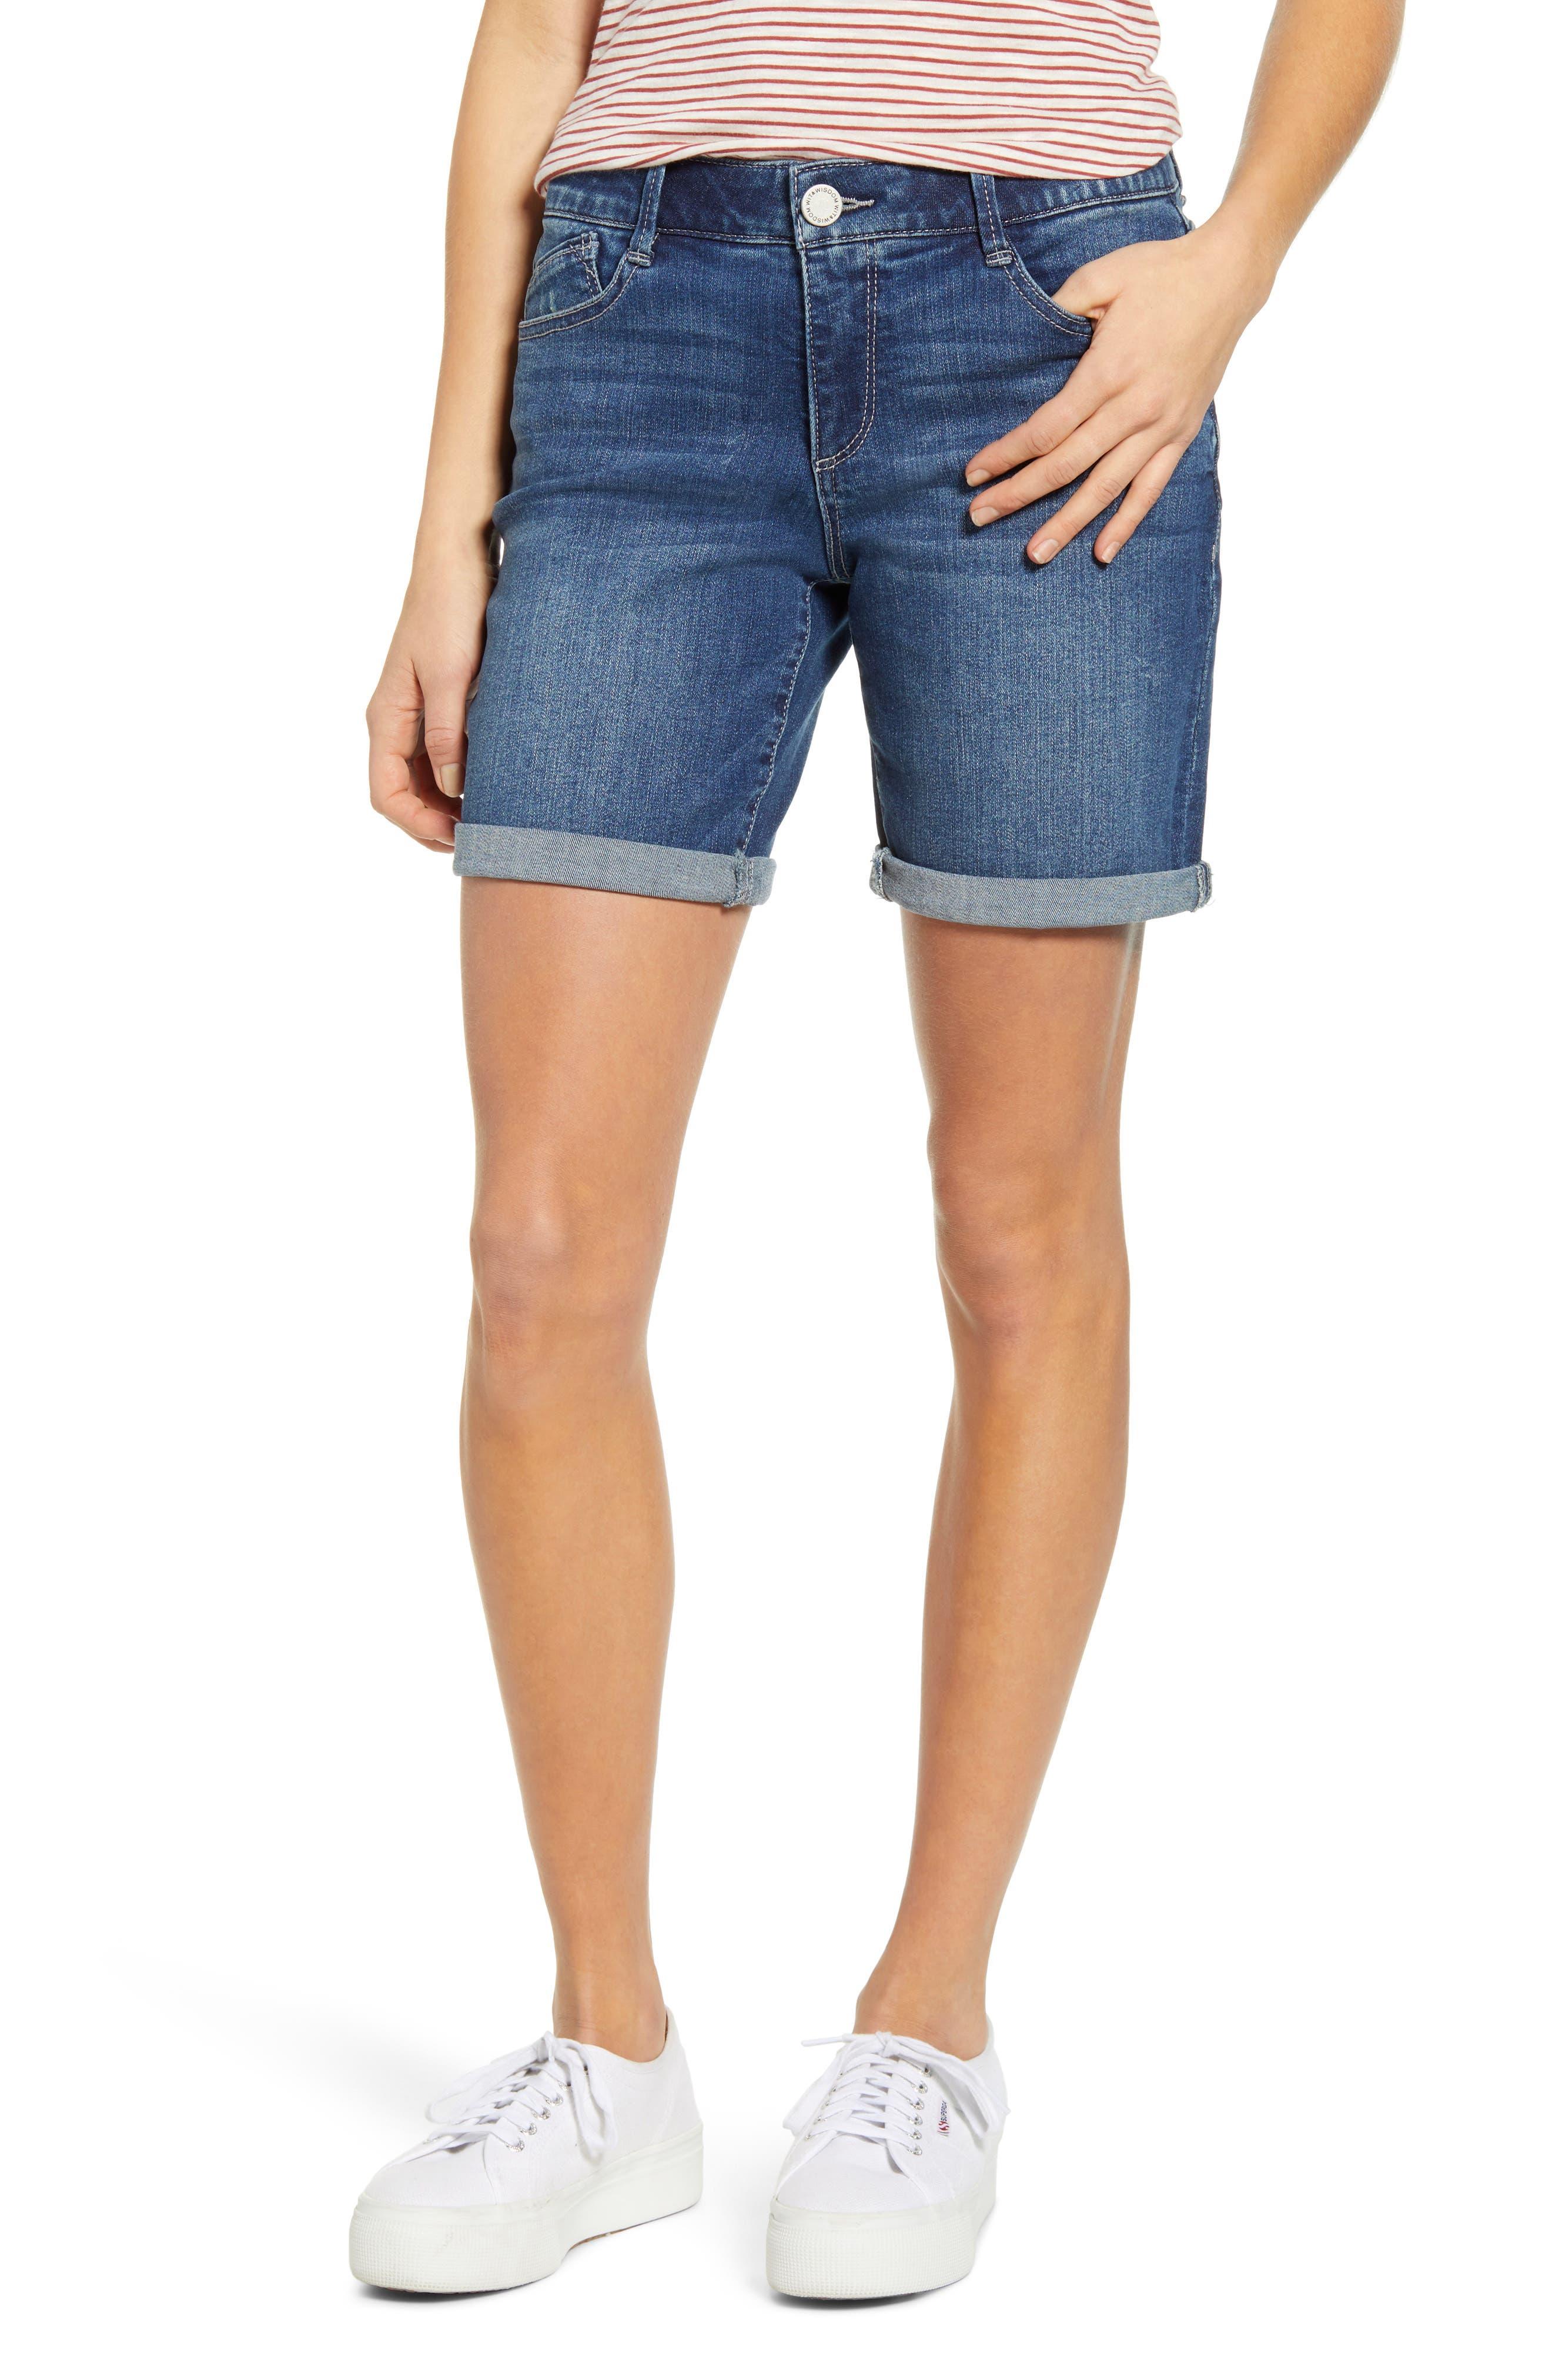 Women's Wit & Wisdom Ab-Solution White Denim Shorts,  00 - Blue (Regular & Petite) (Nordstrom Exclusive)